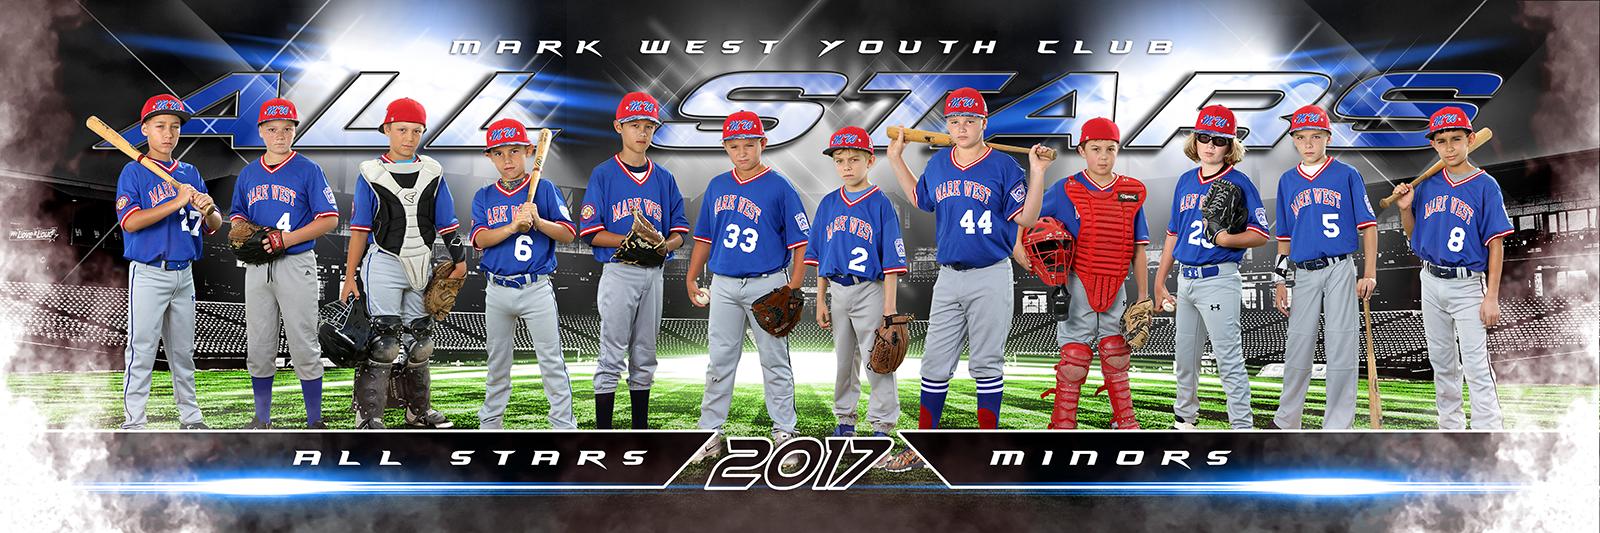 Mvp Sports Pix Team Panoramics